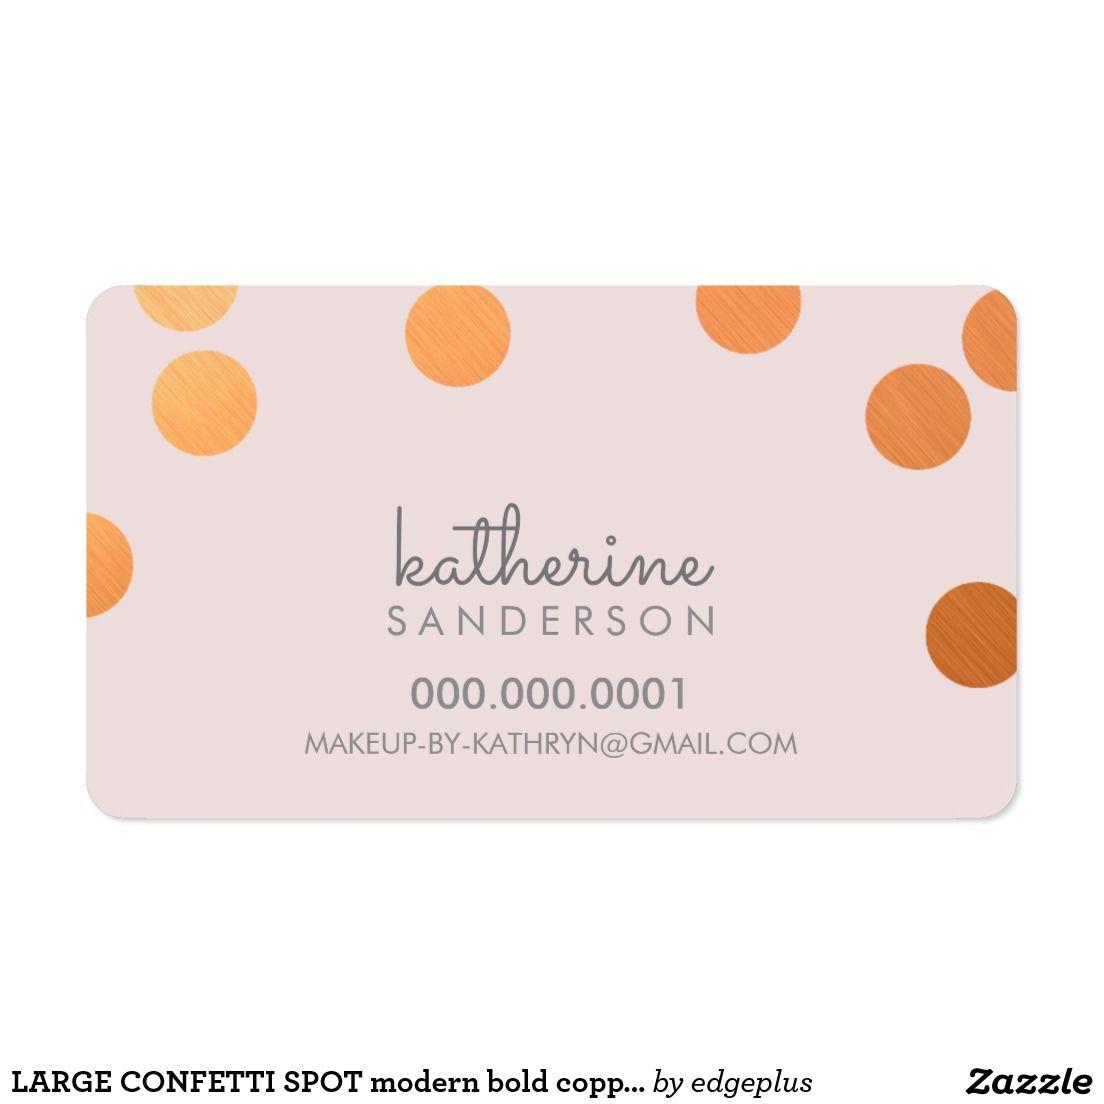 LARGE CONFETTI SPOT modern bold copper faux foil pink Business Card ...